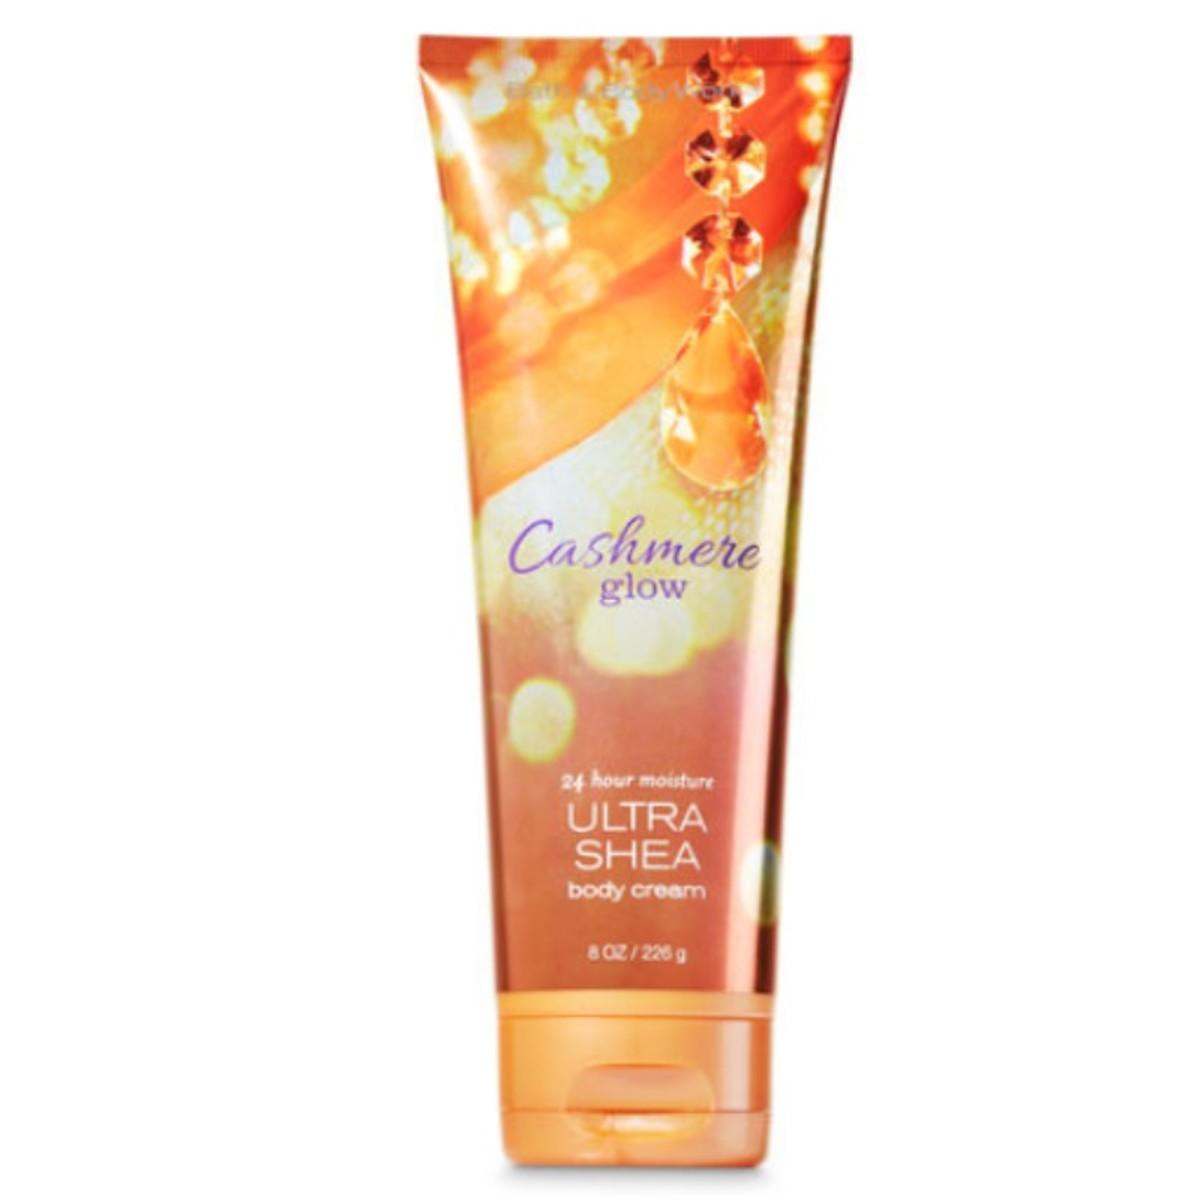 Cashmere Glow - Moisturizing Body Cream (Parallel Imports Product)